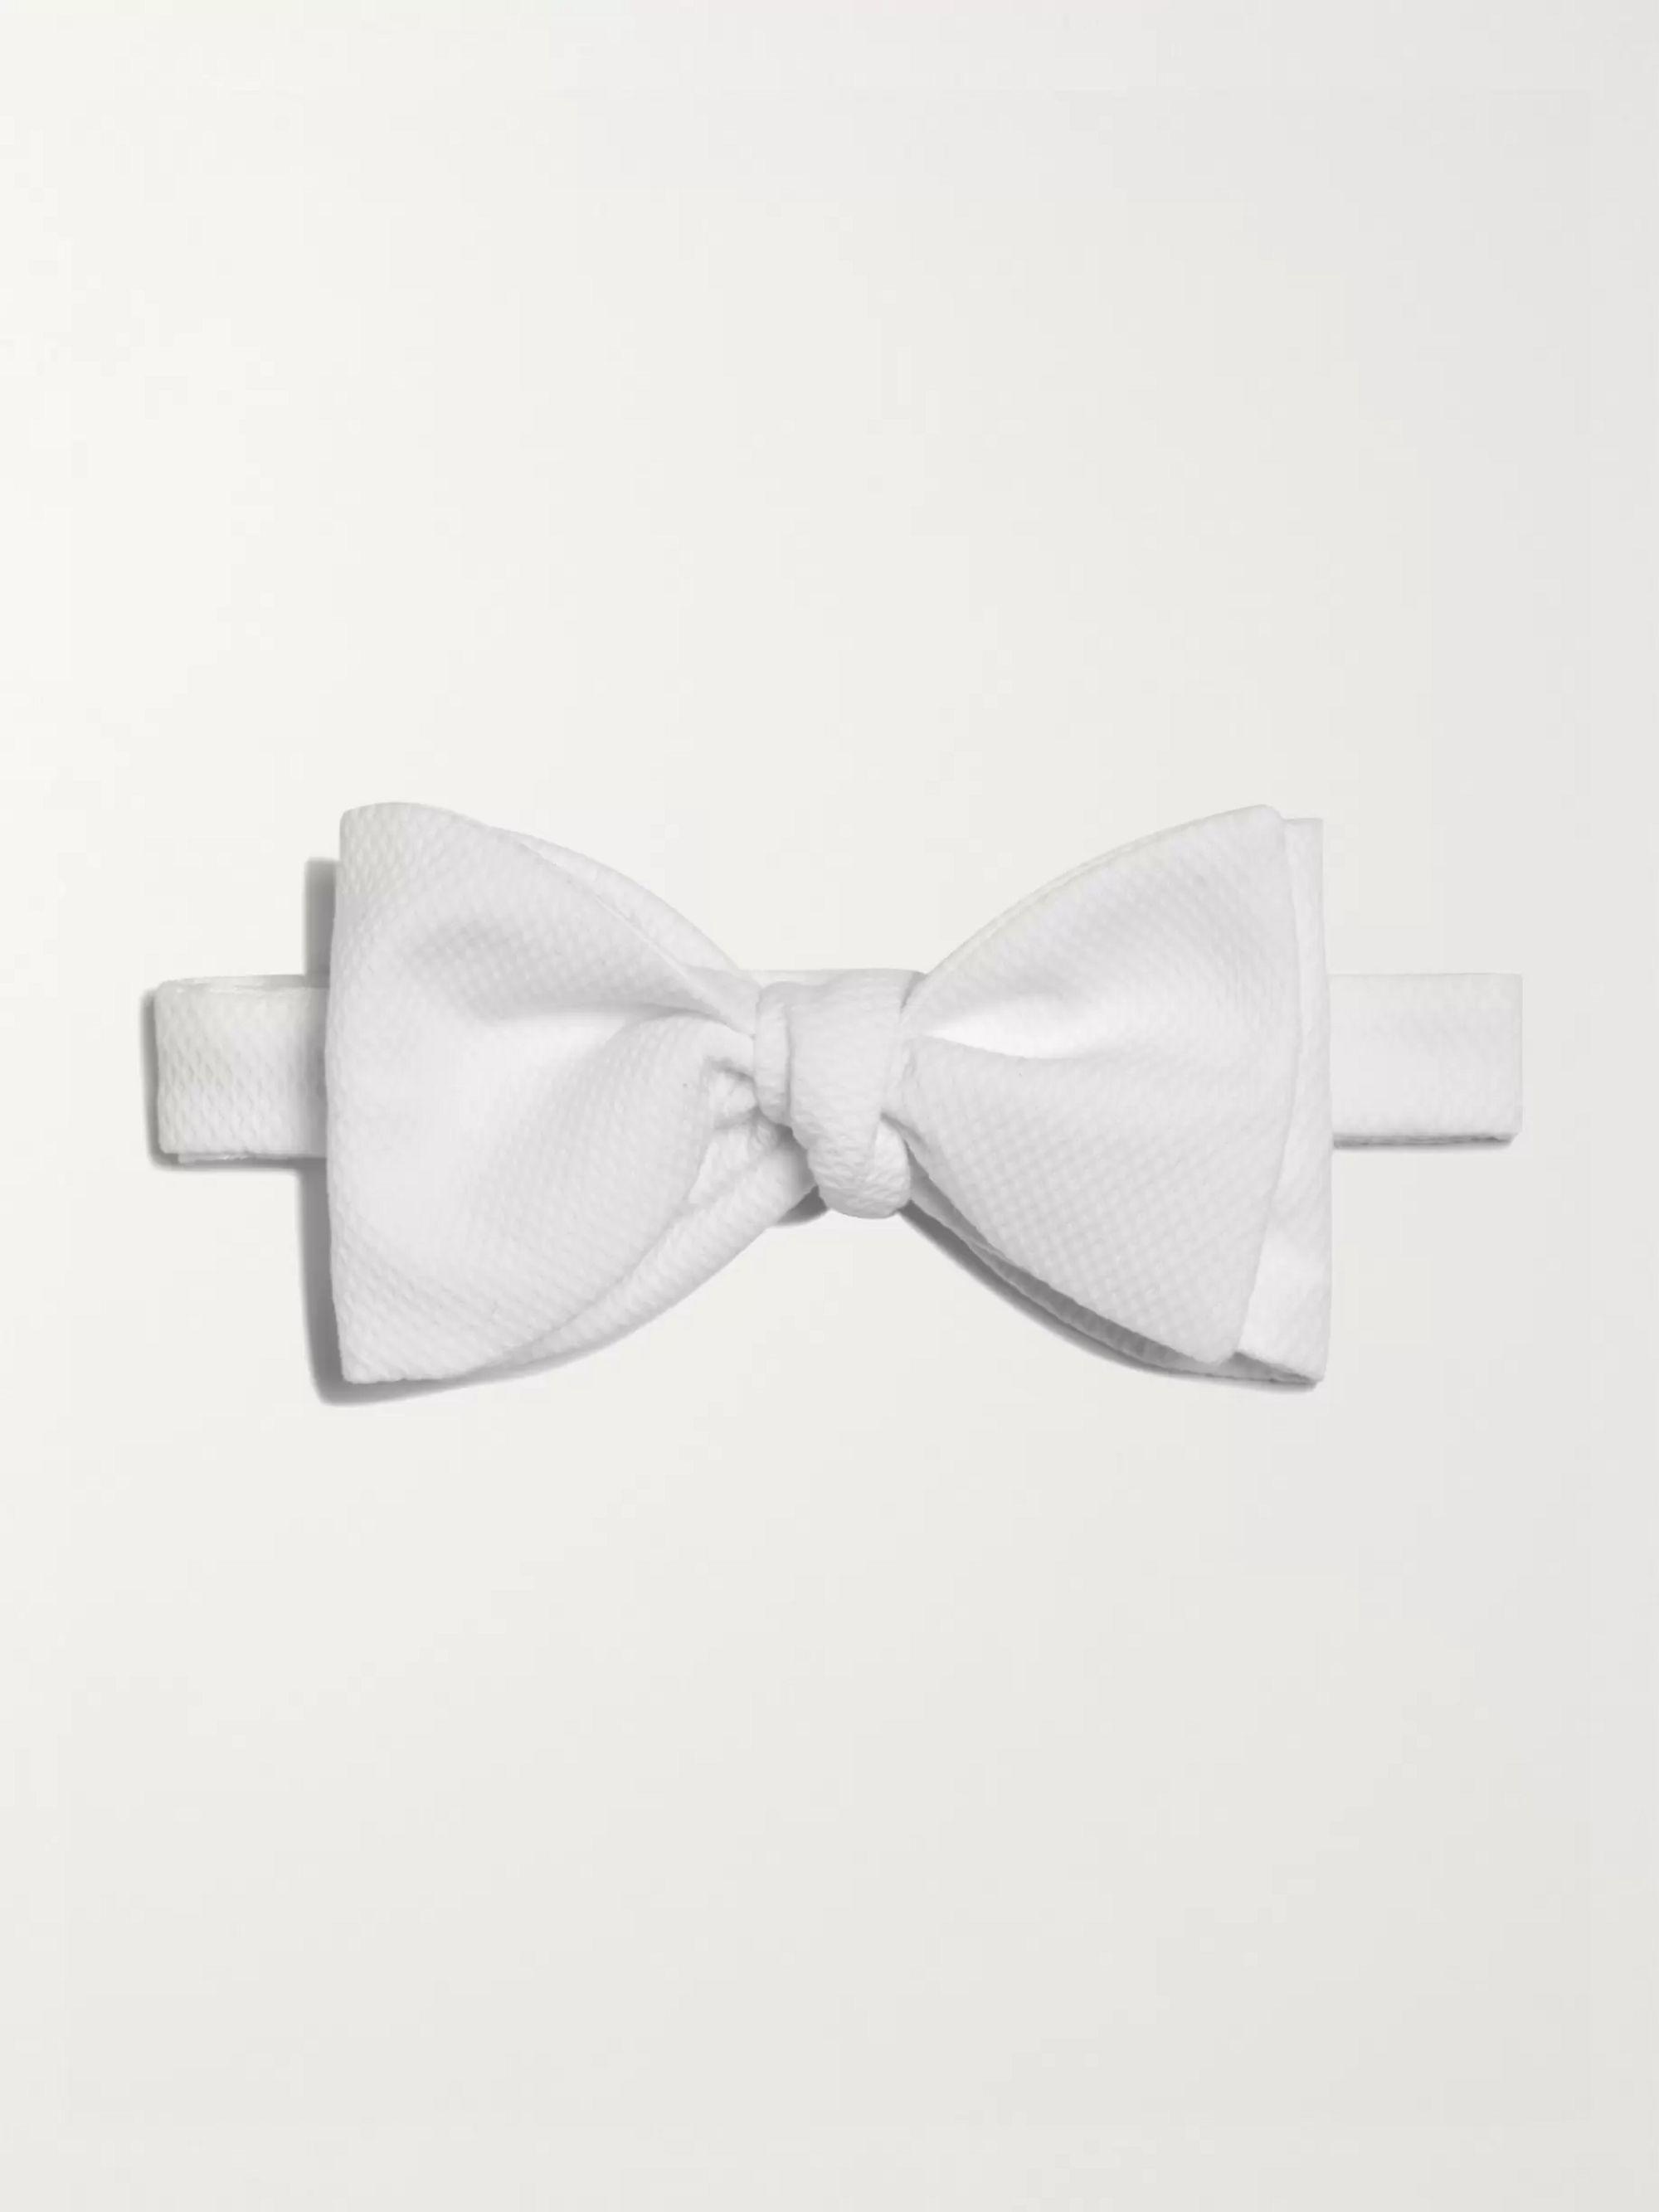 Turnbull & Asser Pre-Tied Cotton-Pique Bow Tie,White